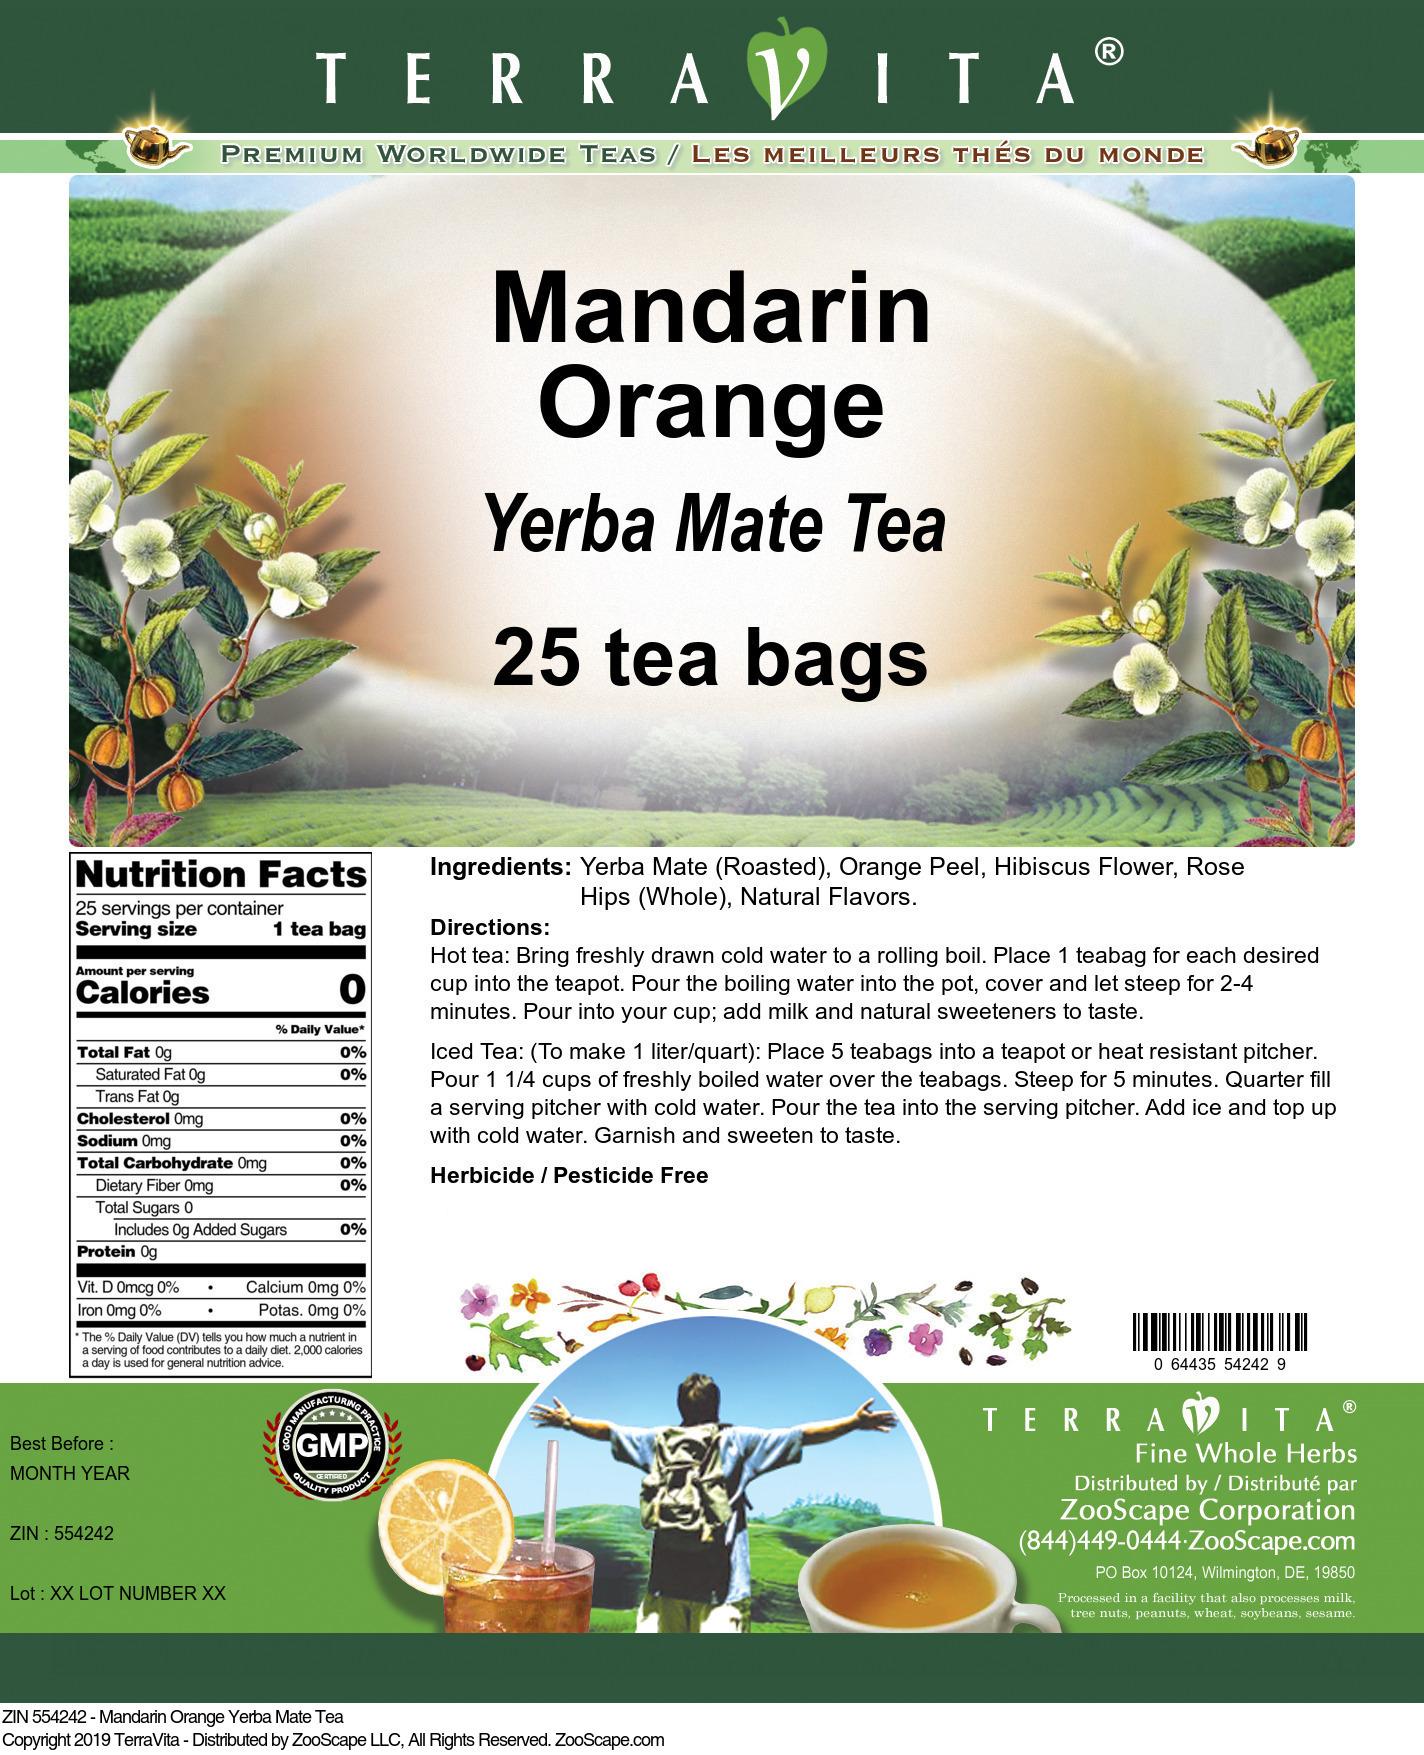 Mandarin Orange Yerba Mate Tea